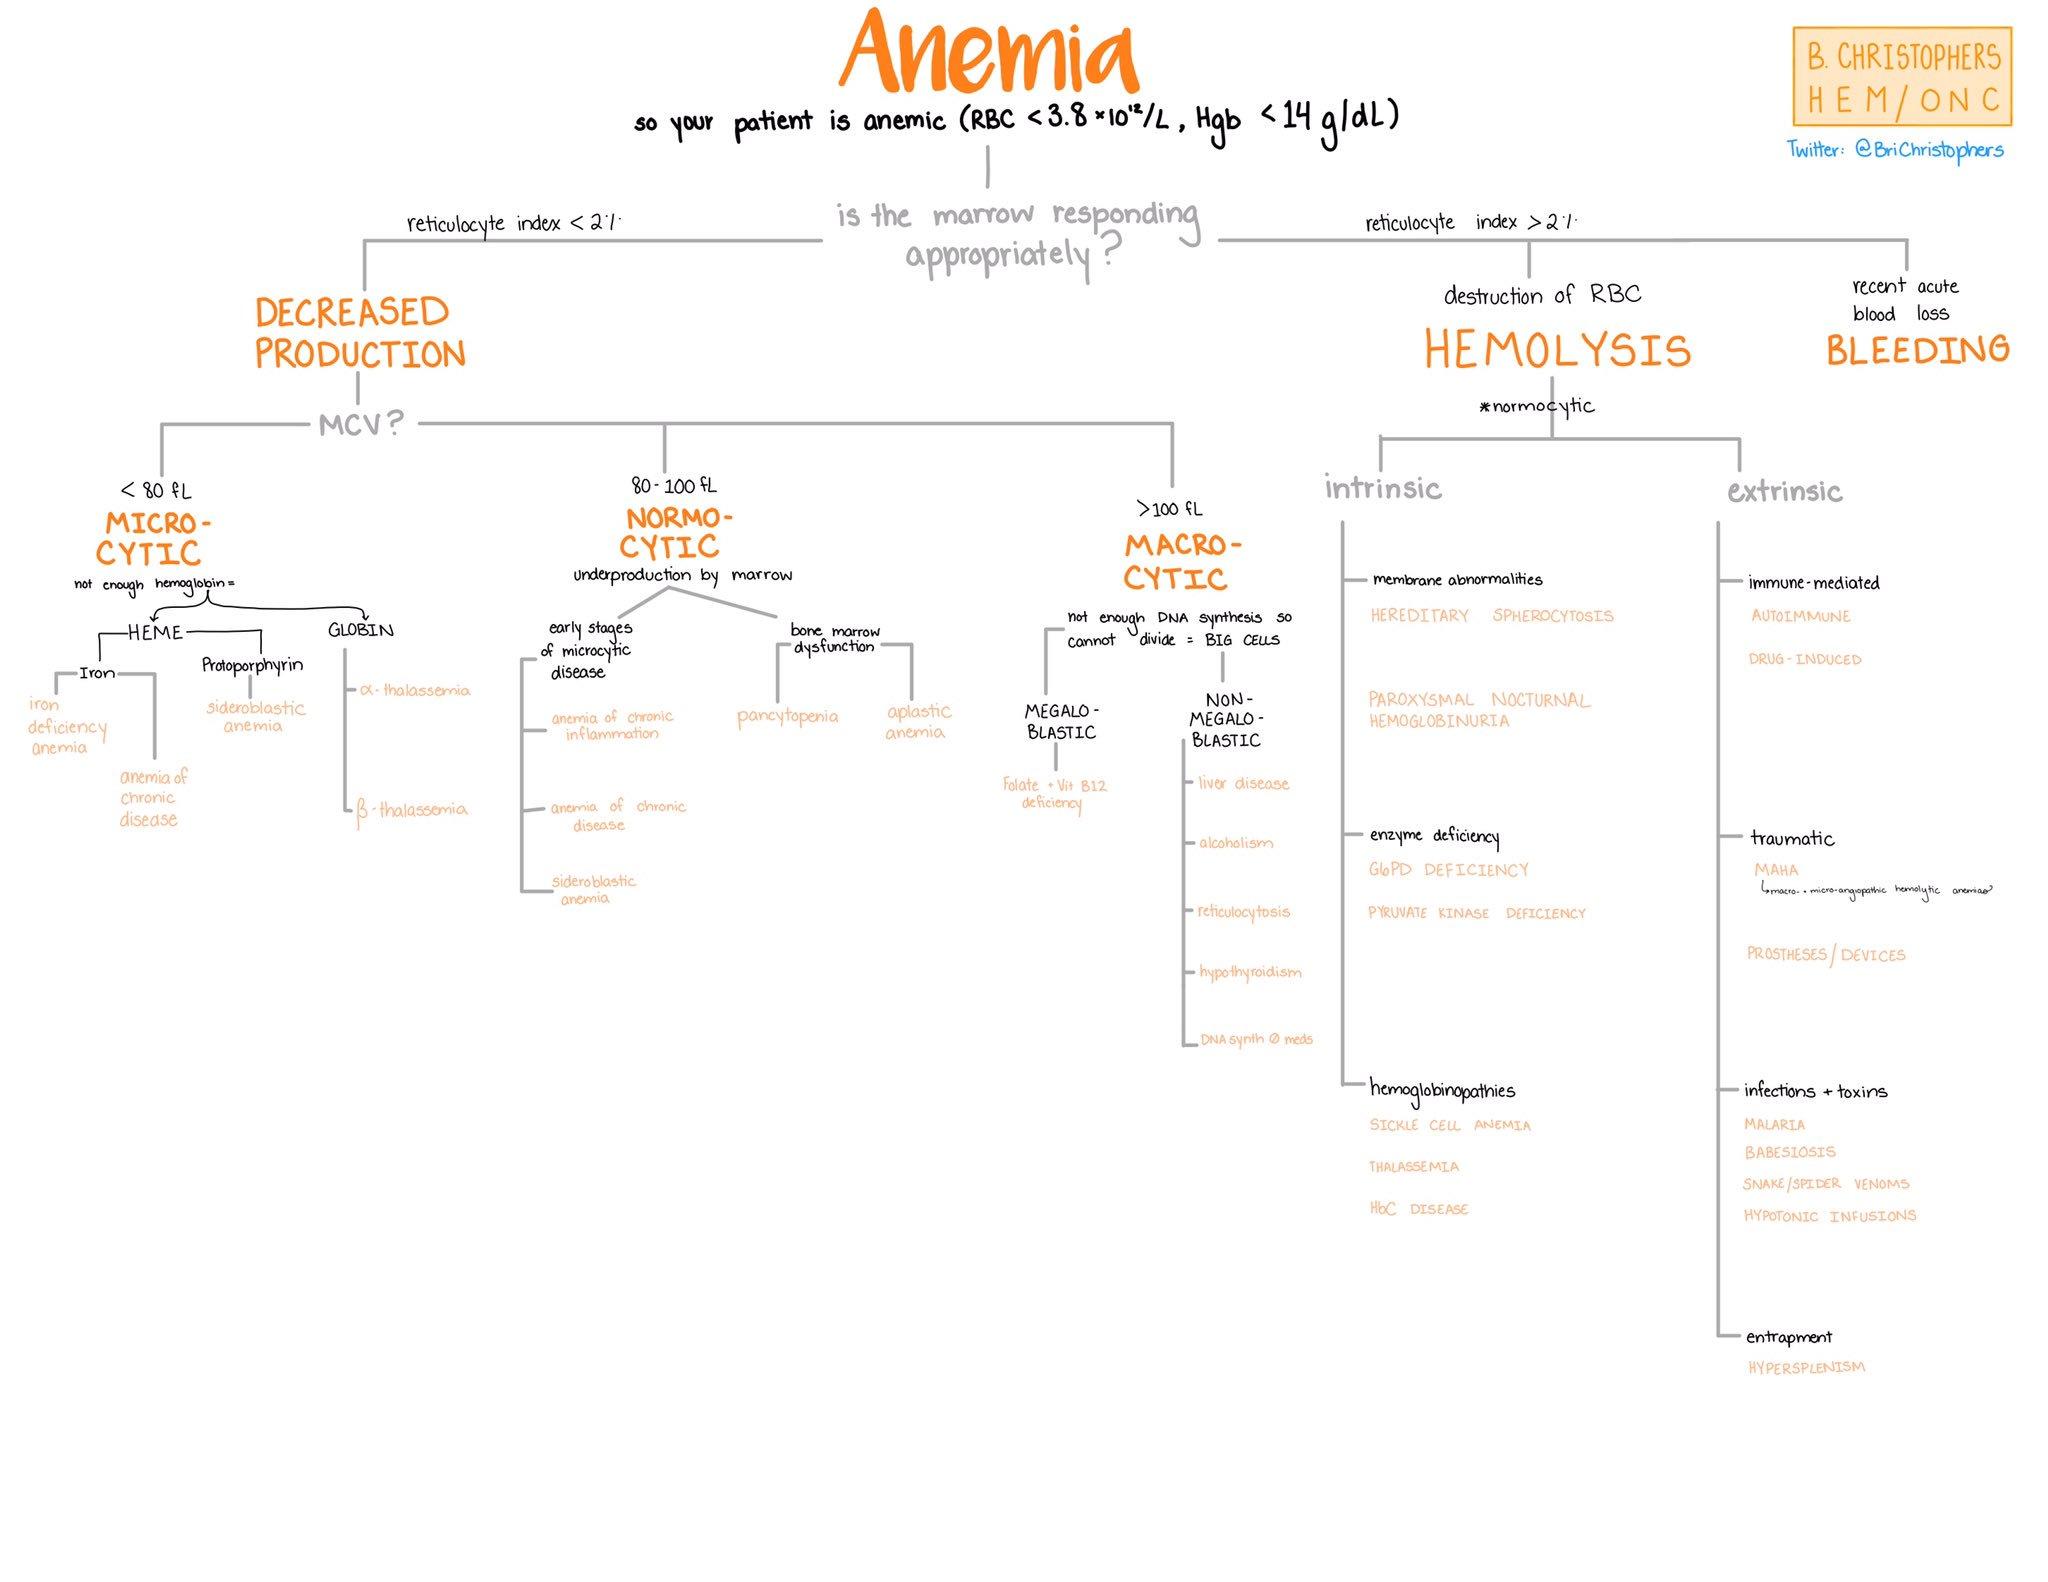 Anemia - Diagnostic Differential Algorithm  - Briana Ruíz Christophers @BriChristophers  #Anemia #Algorithm #Diagnosis #Hematology #Differential